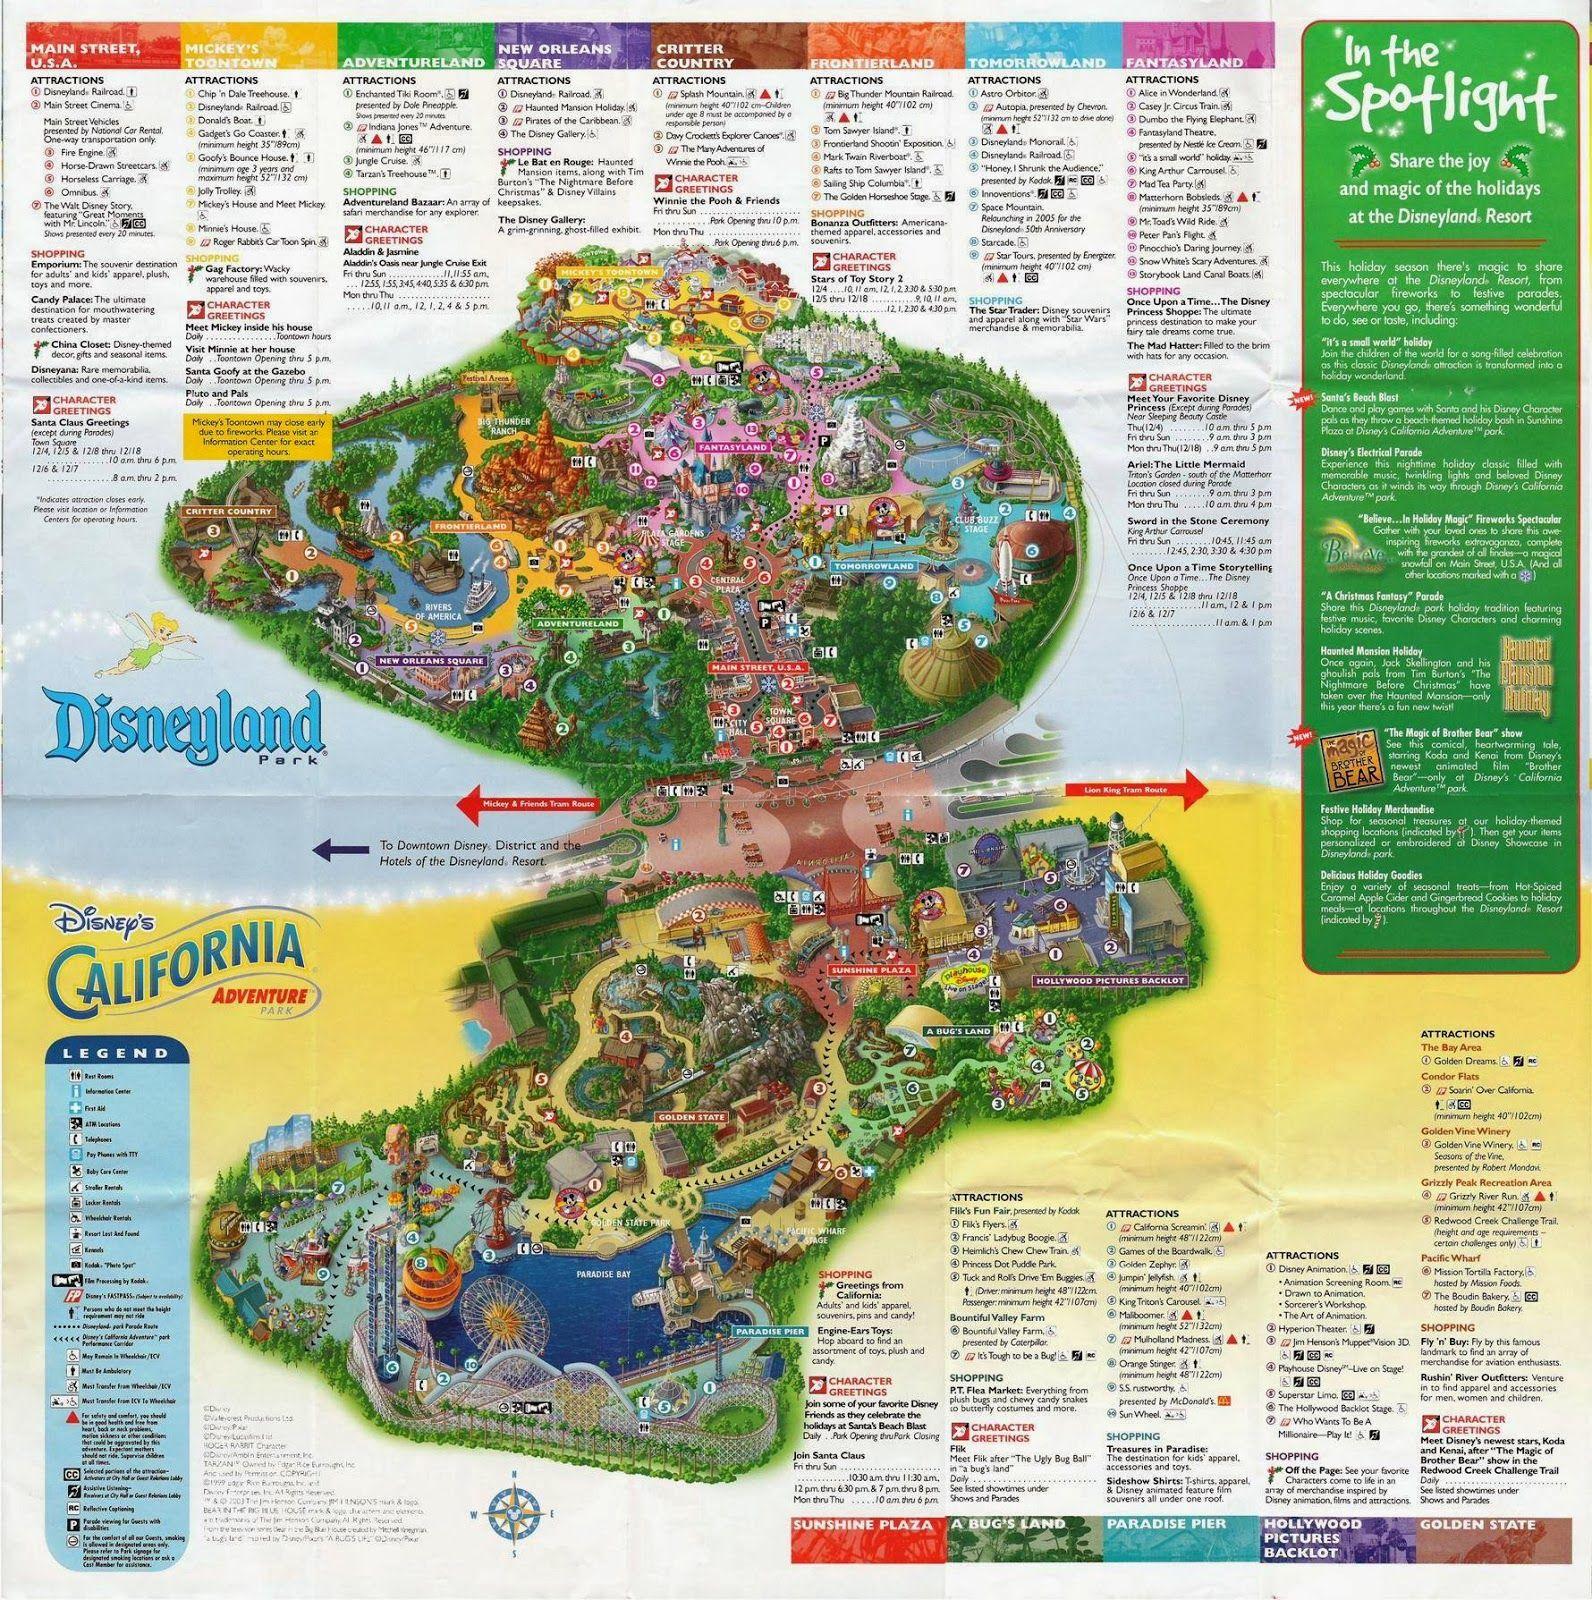 Disneyland Printable Park Map 2014  File Name  Disneylandand